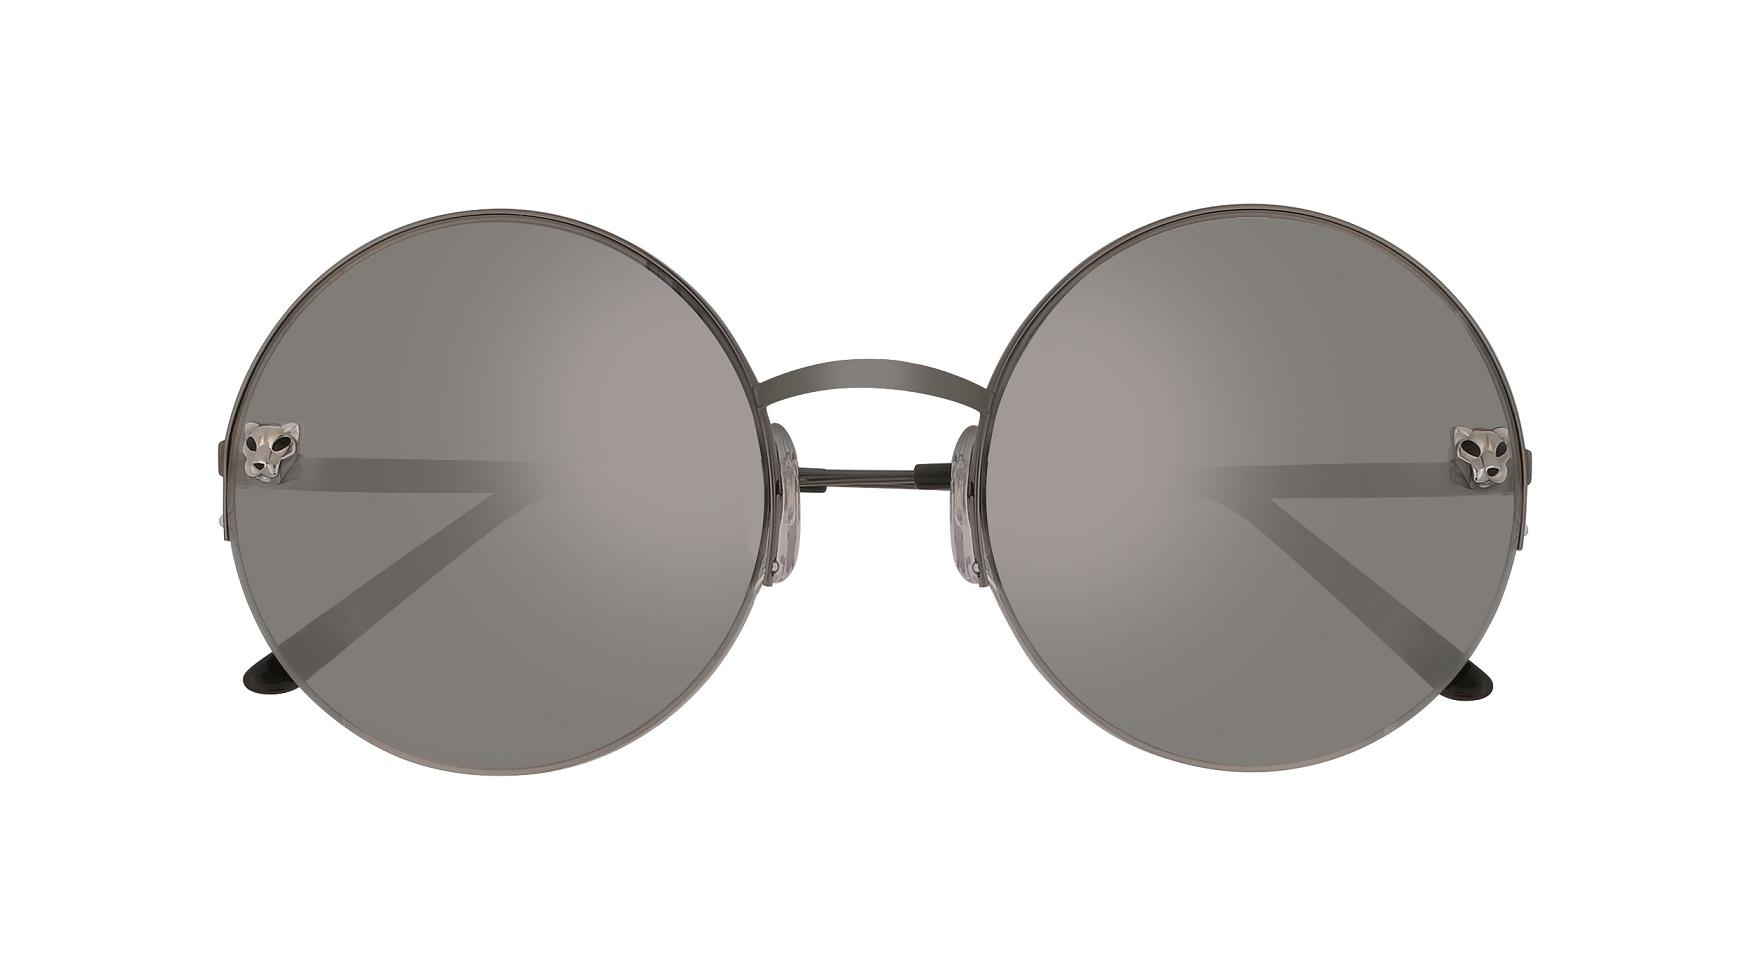 3363687b9 لطالما تميزت النظارات الشمسية الدائرية بشكلها العصري الأنيق وتفضلها العديد  من عاشقات الموضة المخلصات. والأخبار السعيدة أنها من ضمن صيحات موسم صيف 2018.